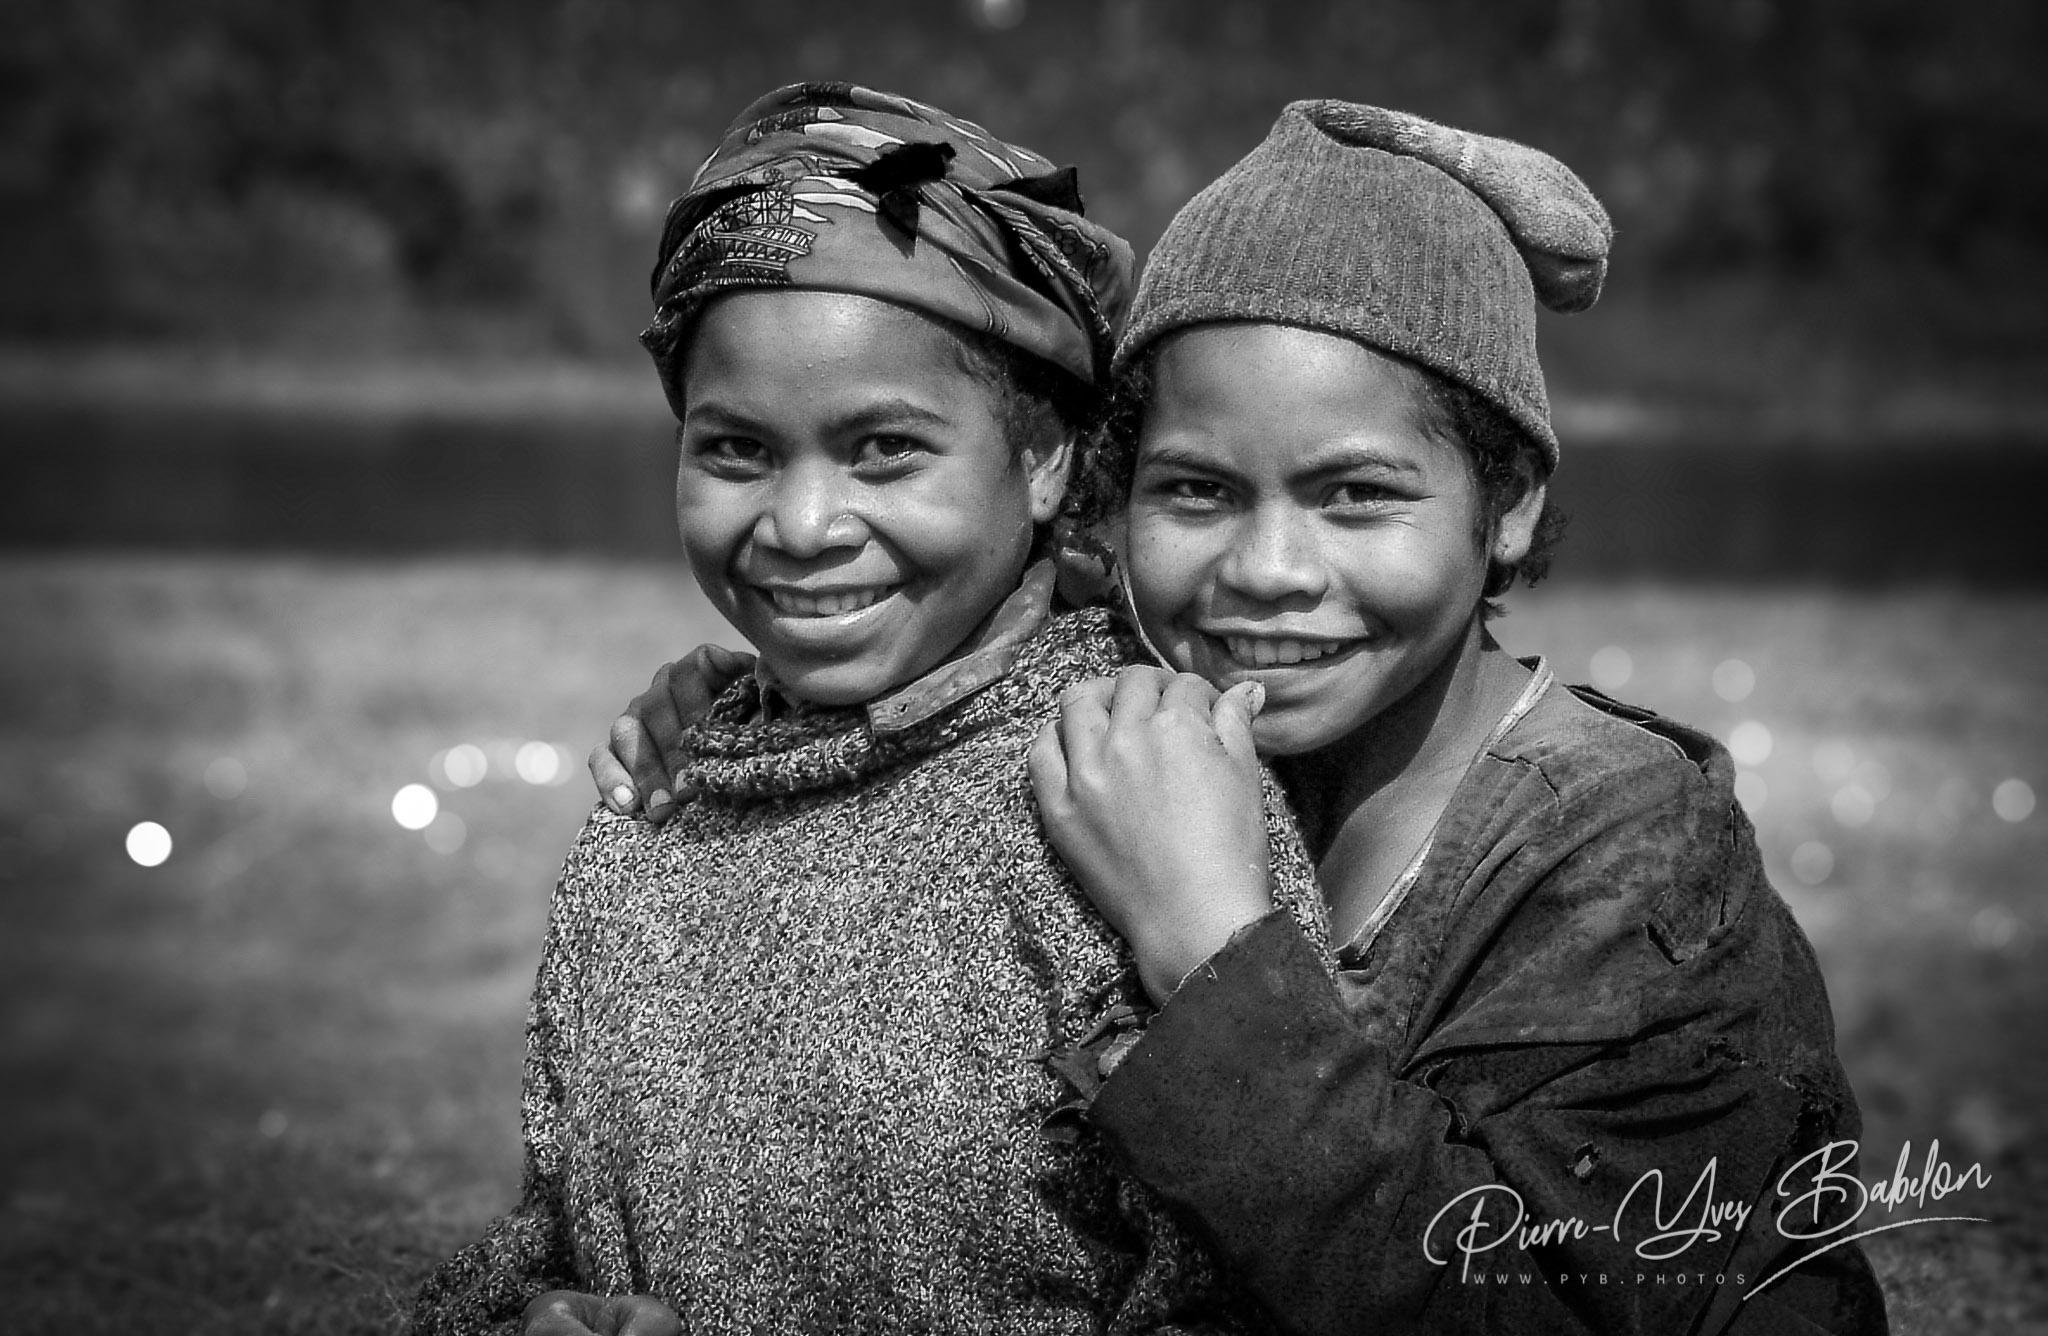 Enfants Betsileo près de Fianarantsoa, Madagascar.